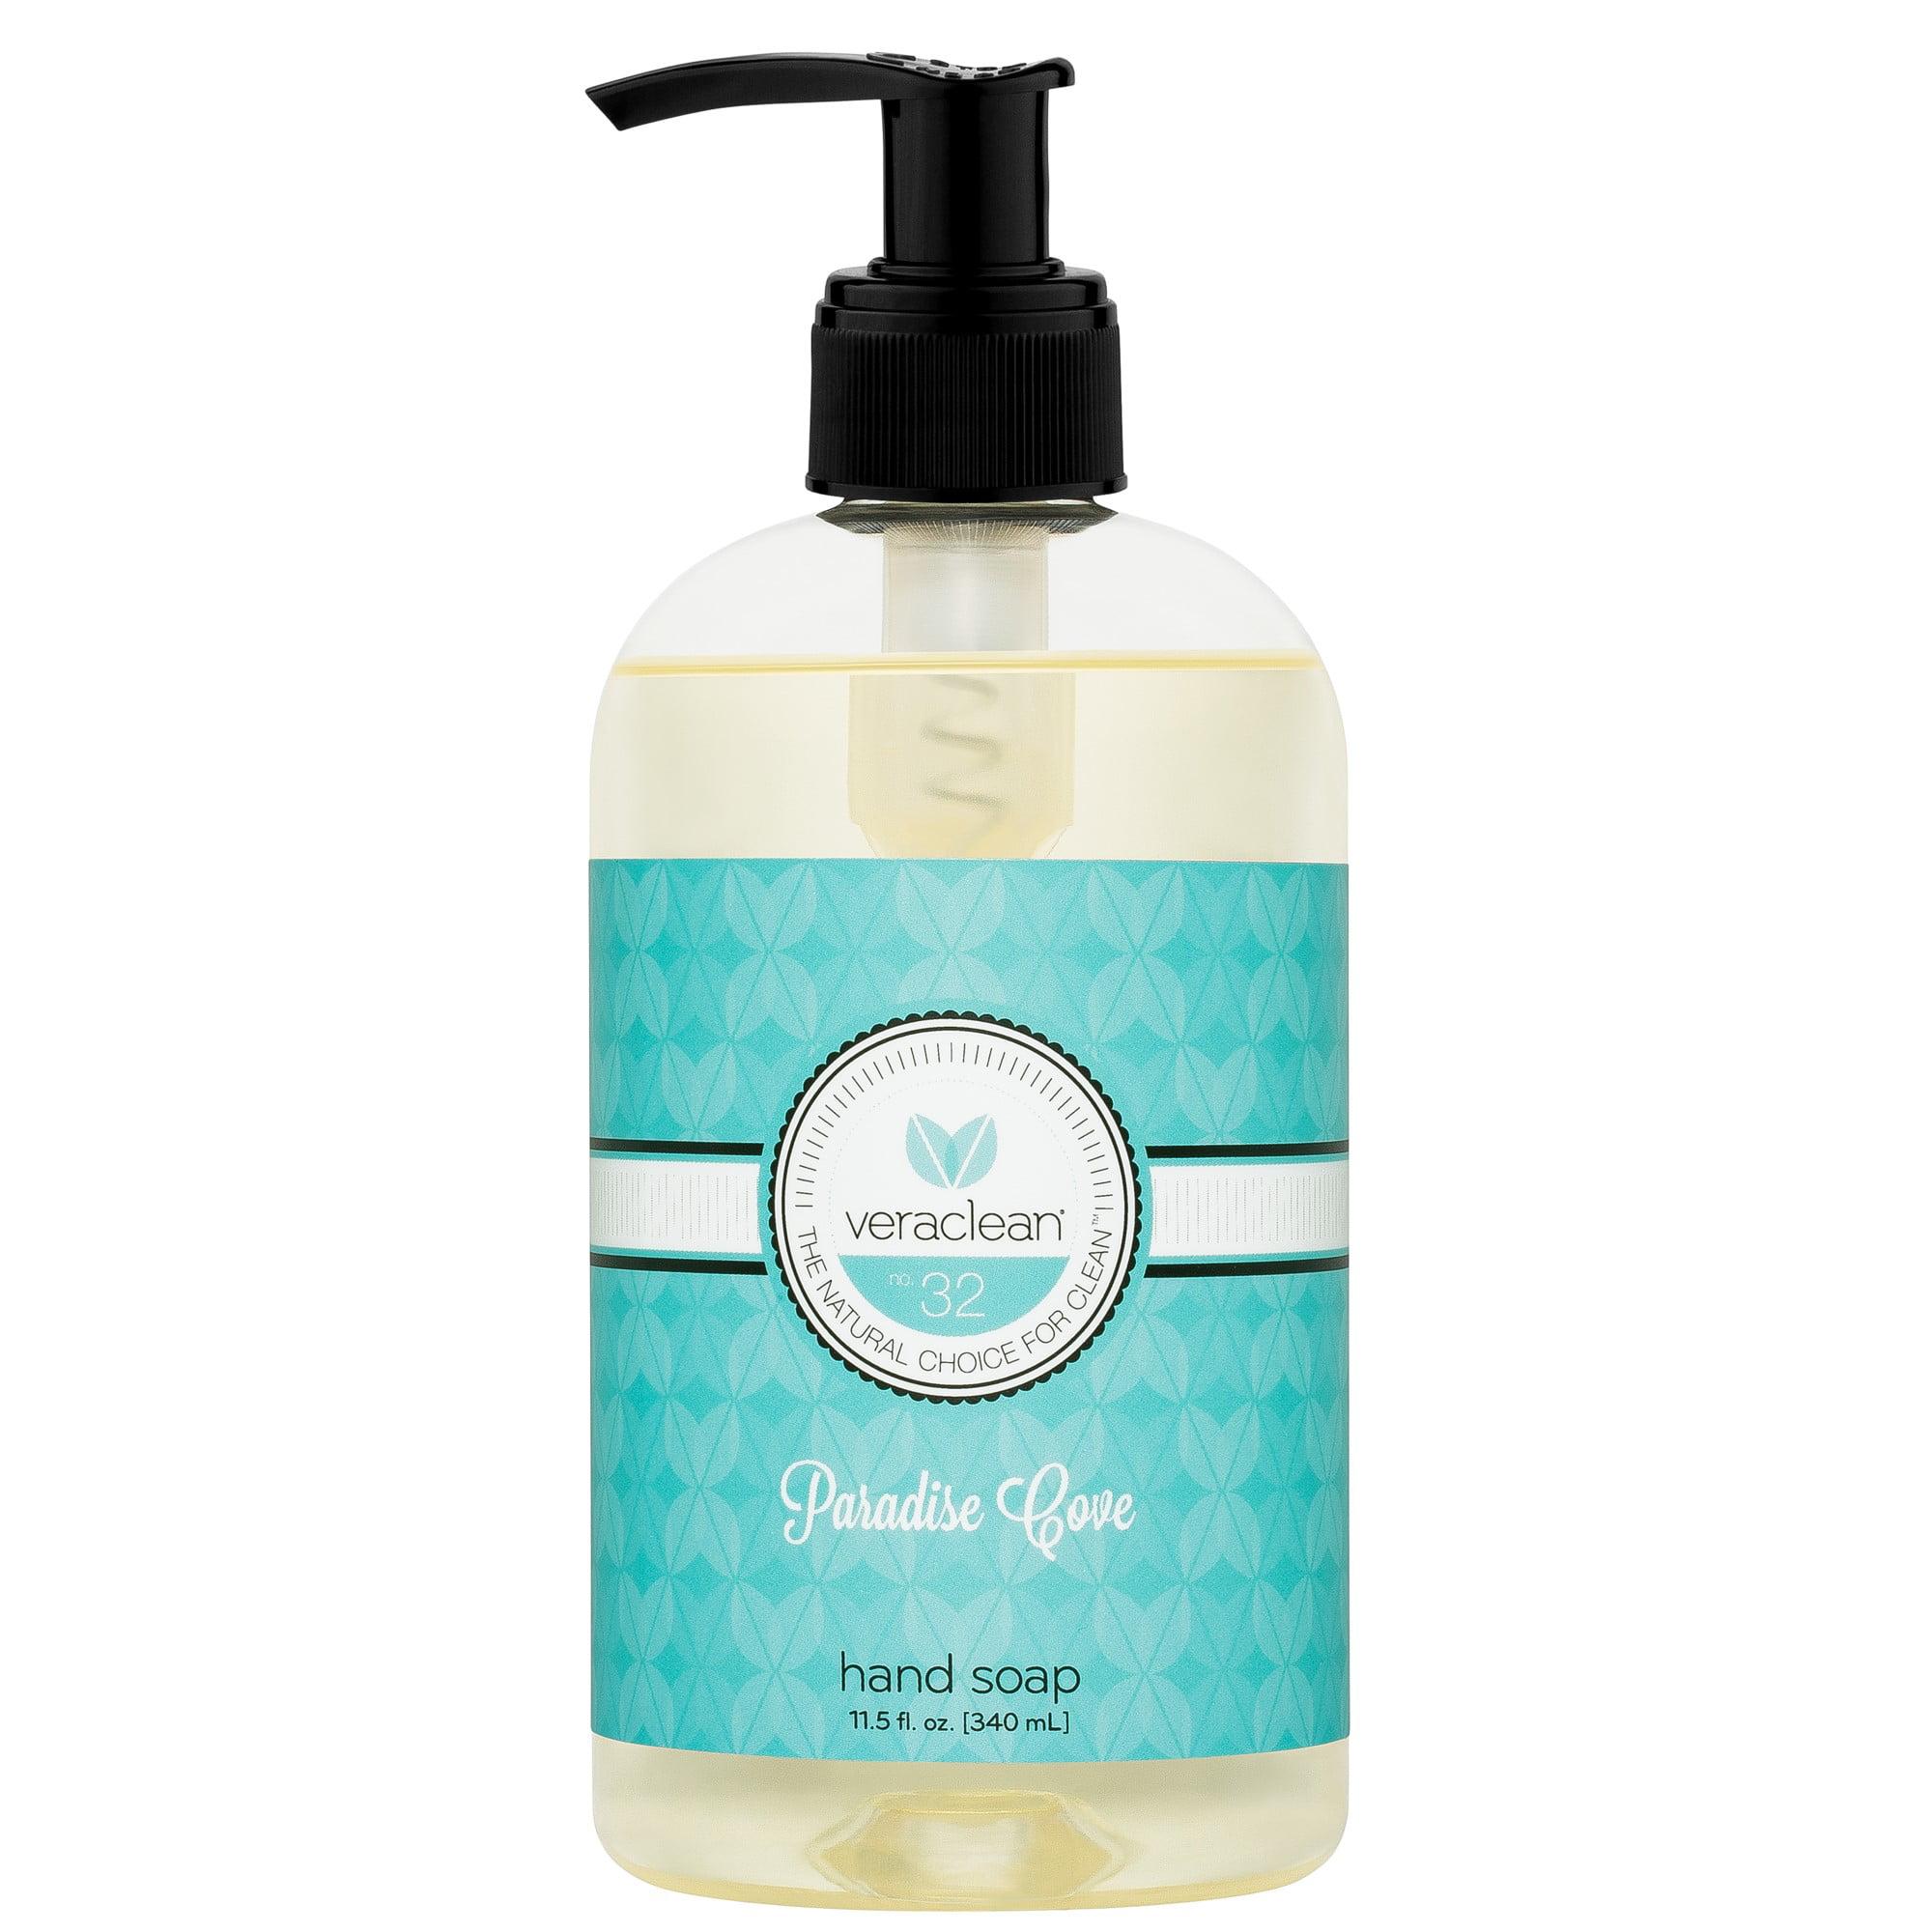 VeraClean Hand Soap, Paradise Cove, 11.5 Fl Oz by VeraClean